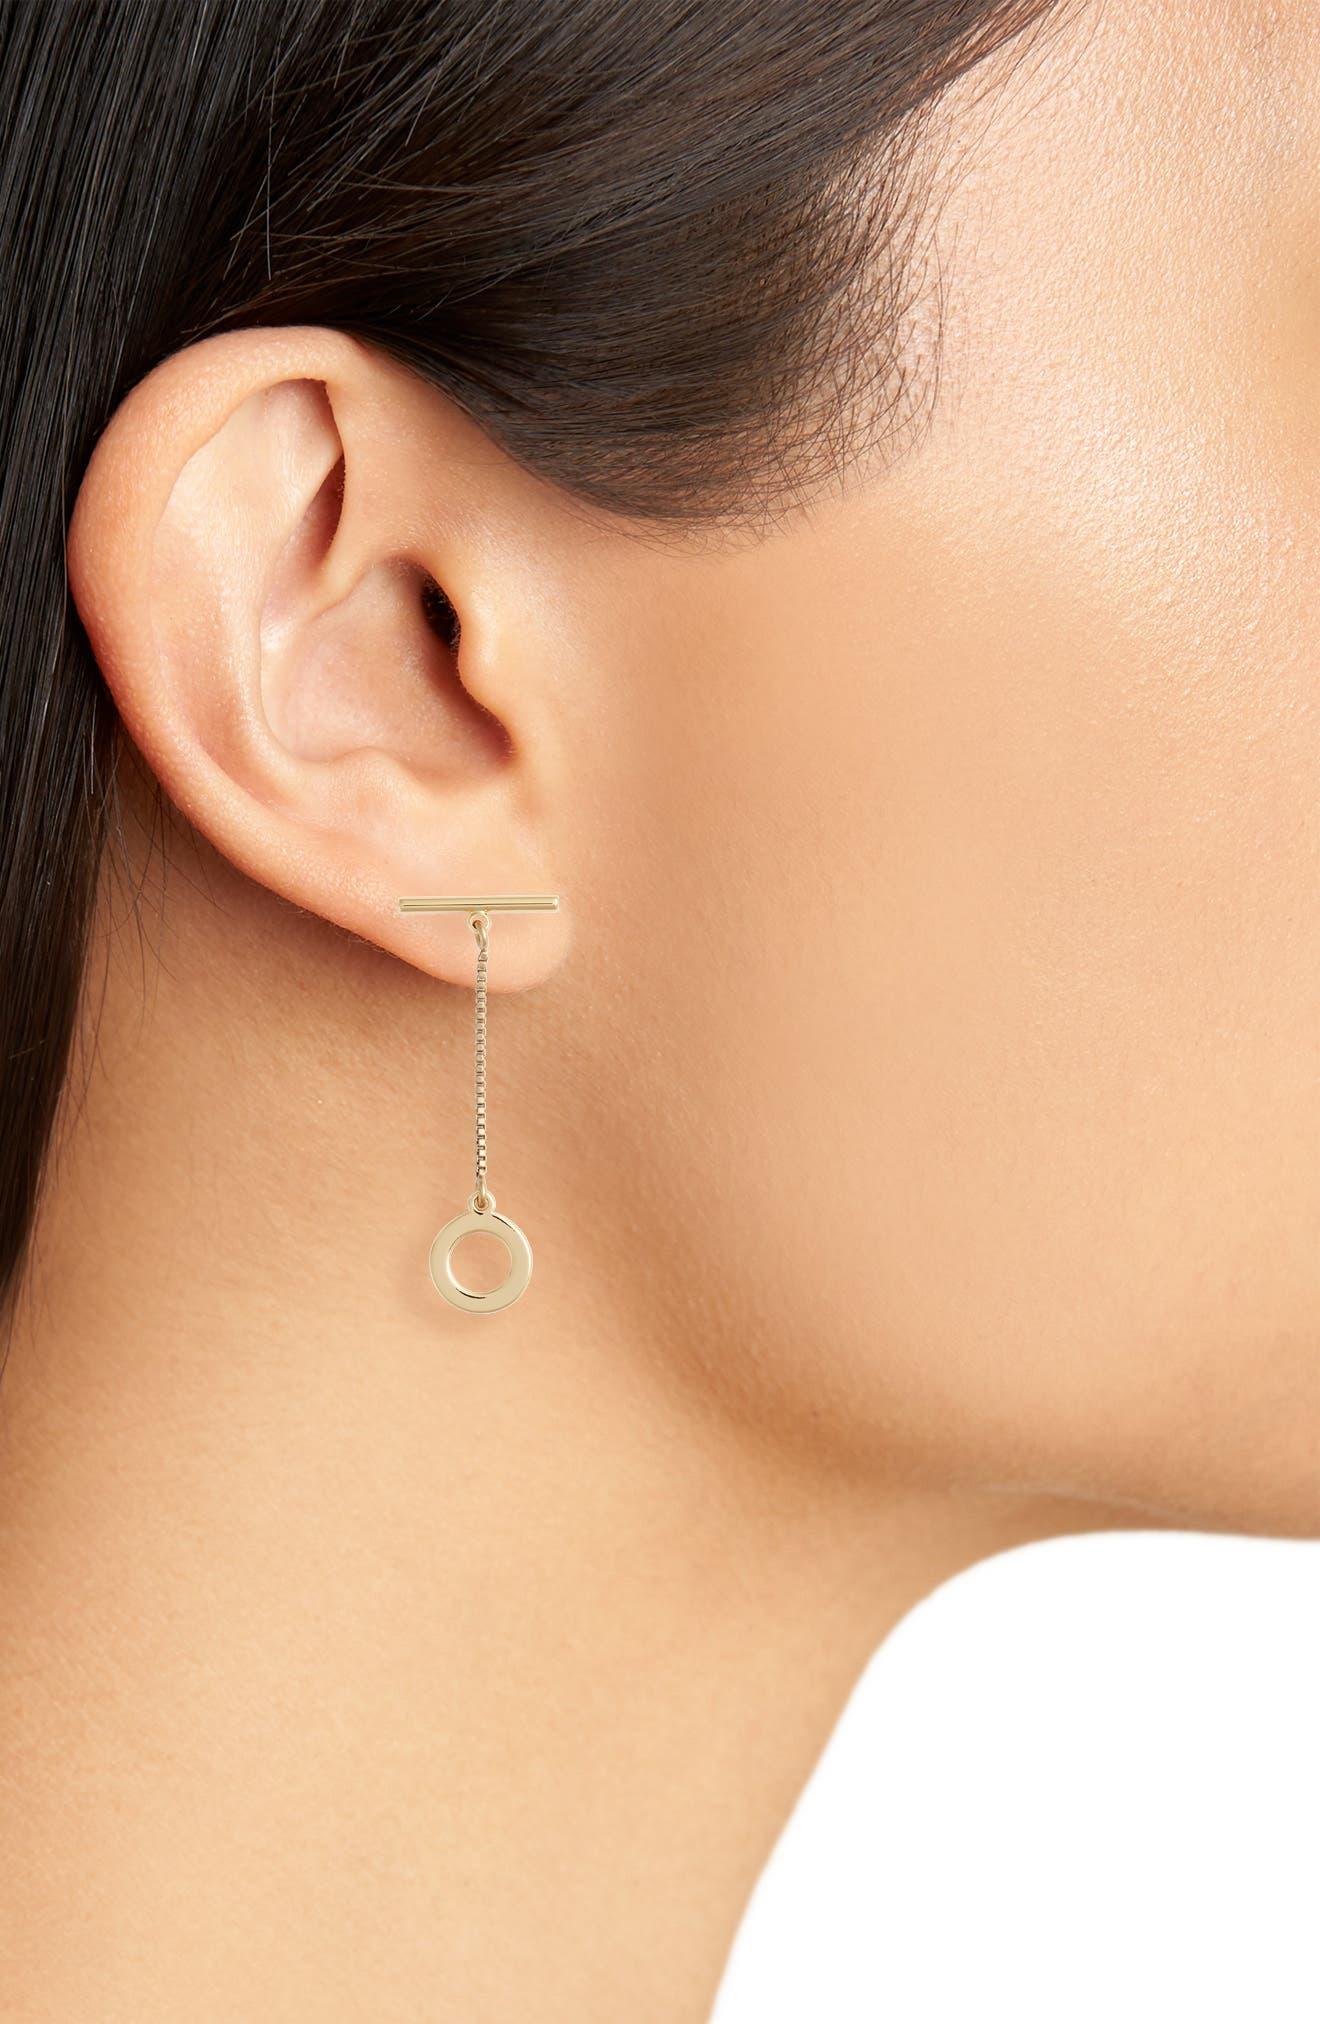 Mimis Hoop Drop Earrings,                             Alternate thumbnail 2, color,                             GOLD